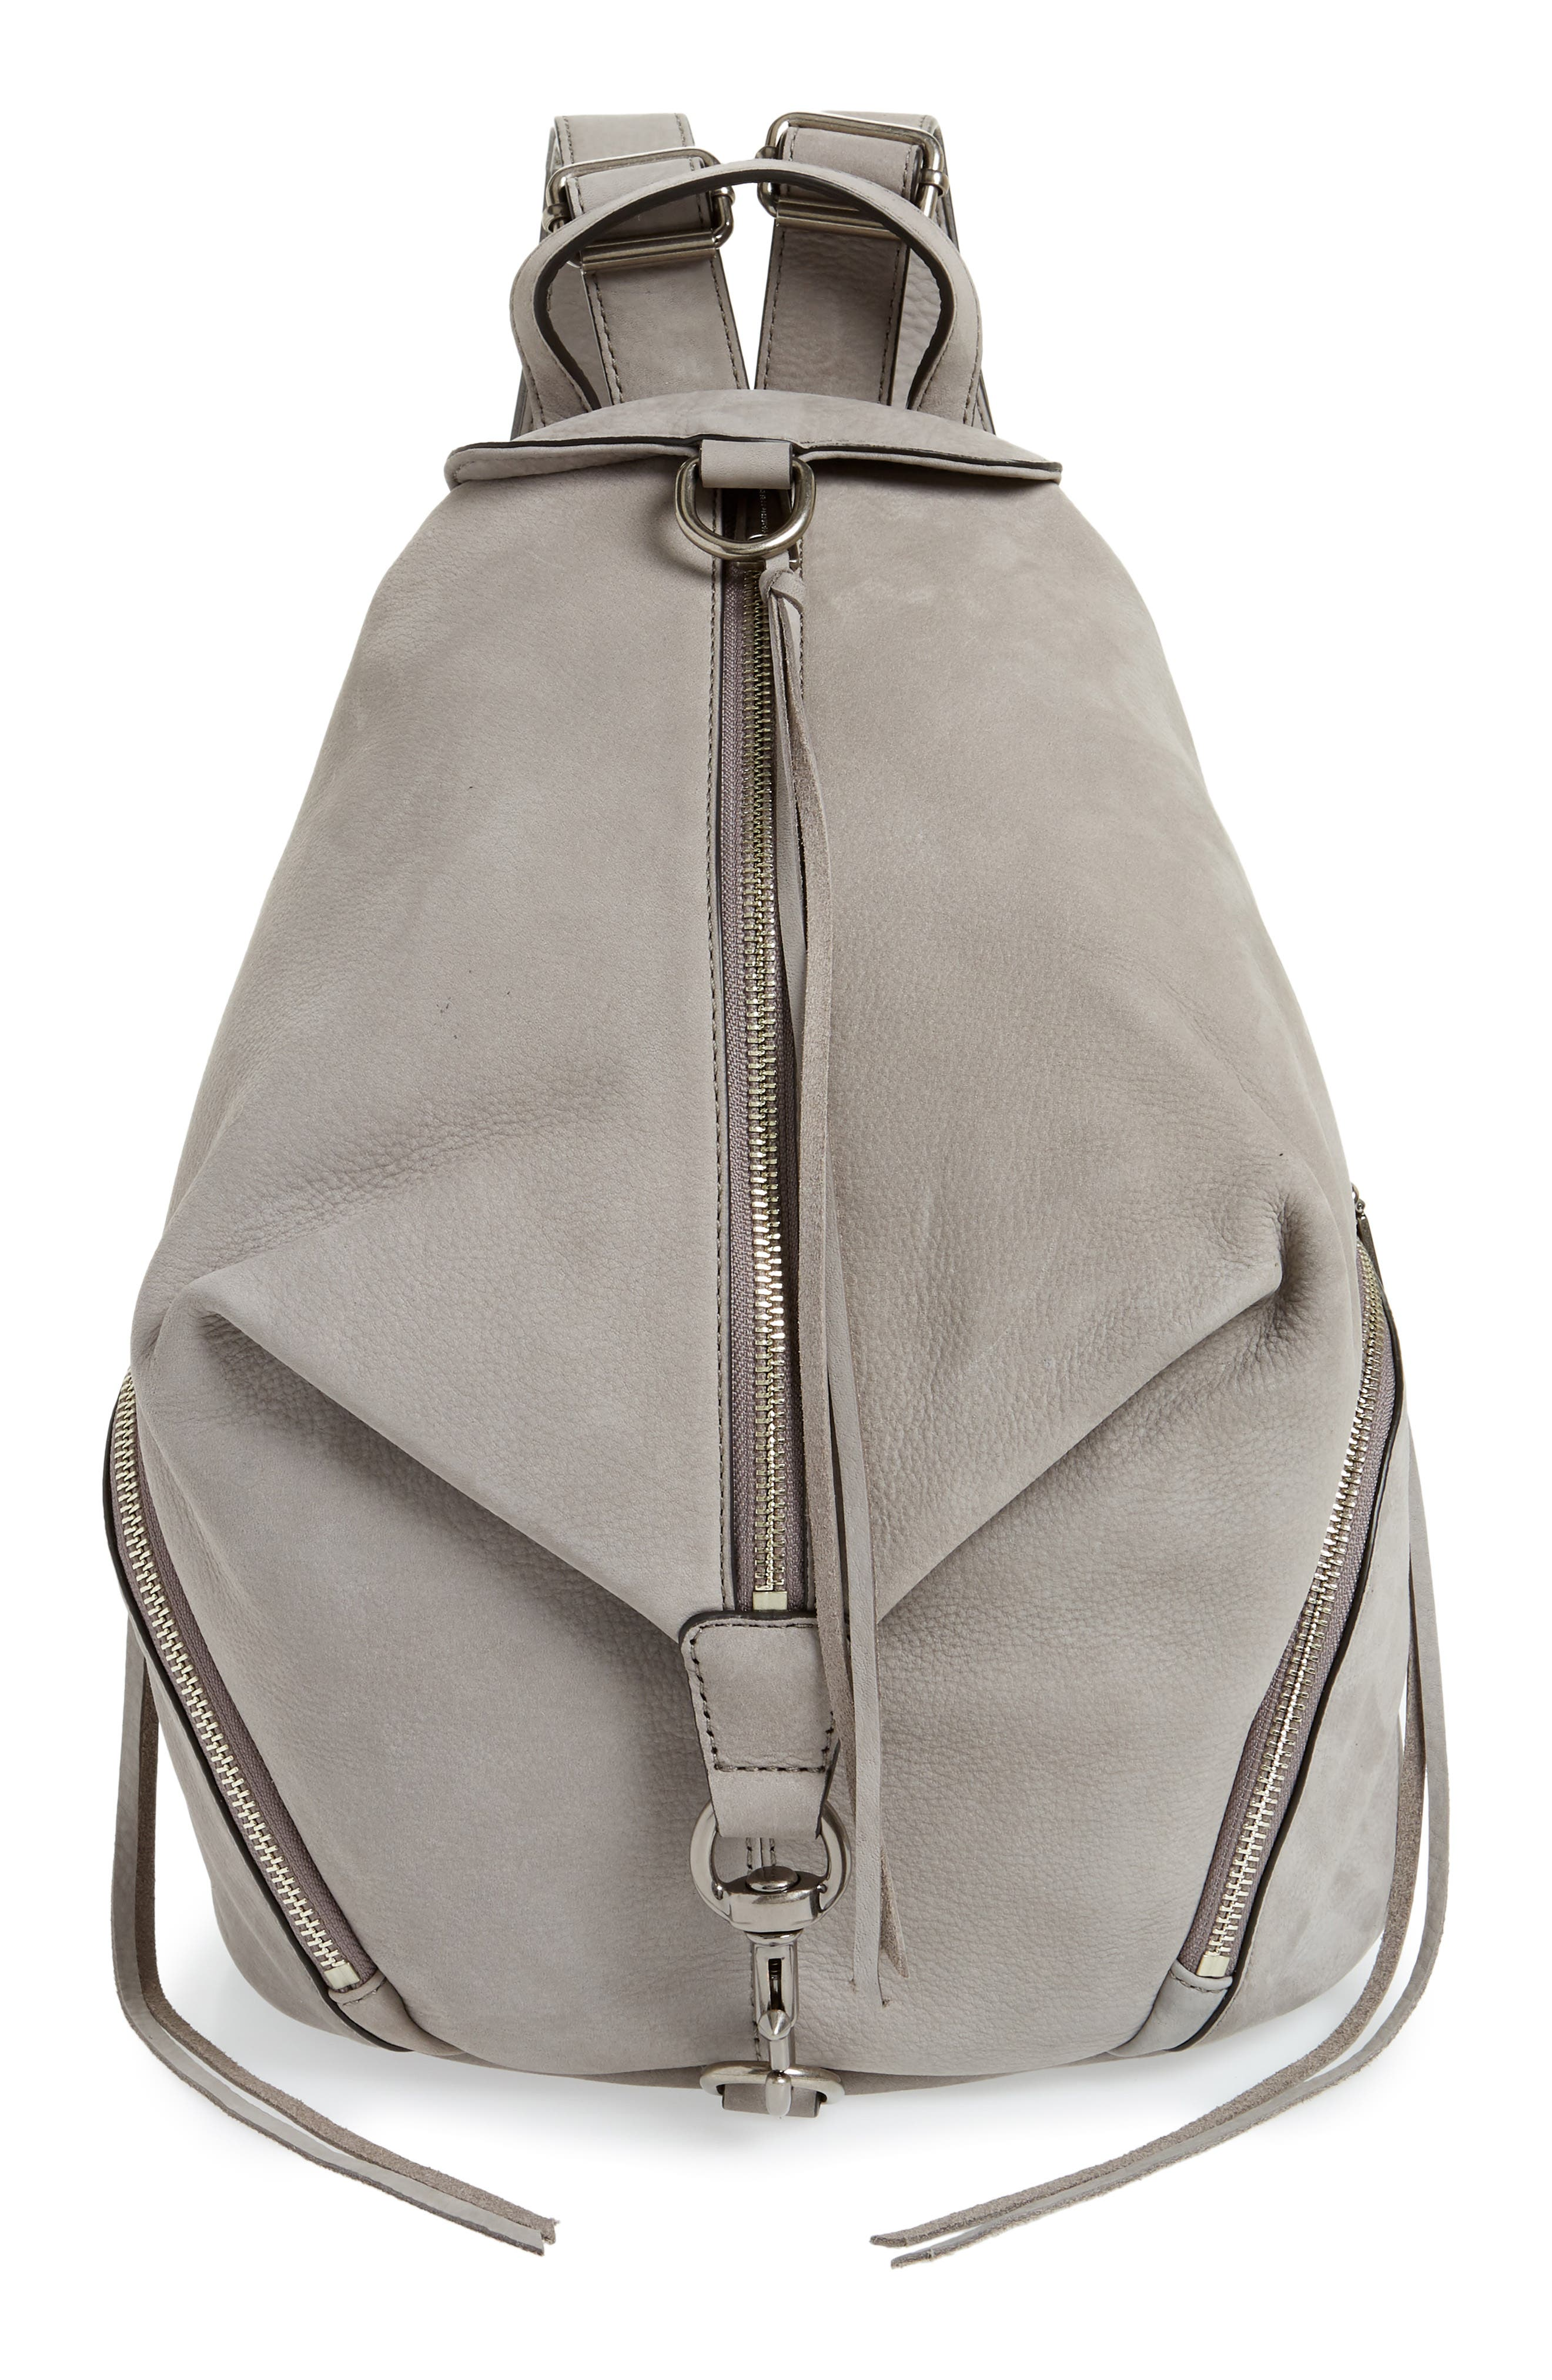 Julian Nubuck Leather Backpack,                             Main thumbnail 1, color,                             GREY